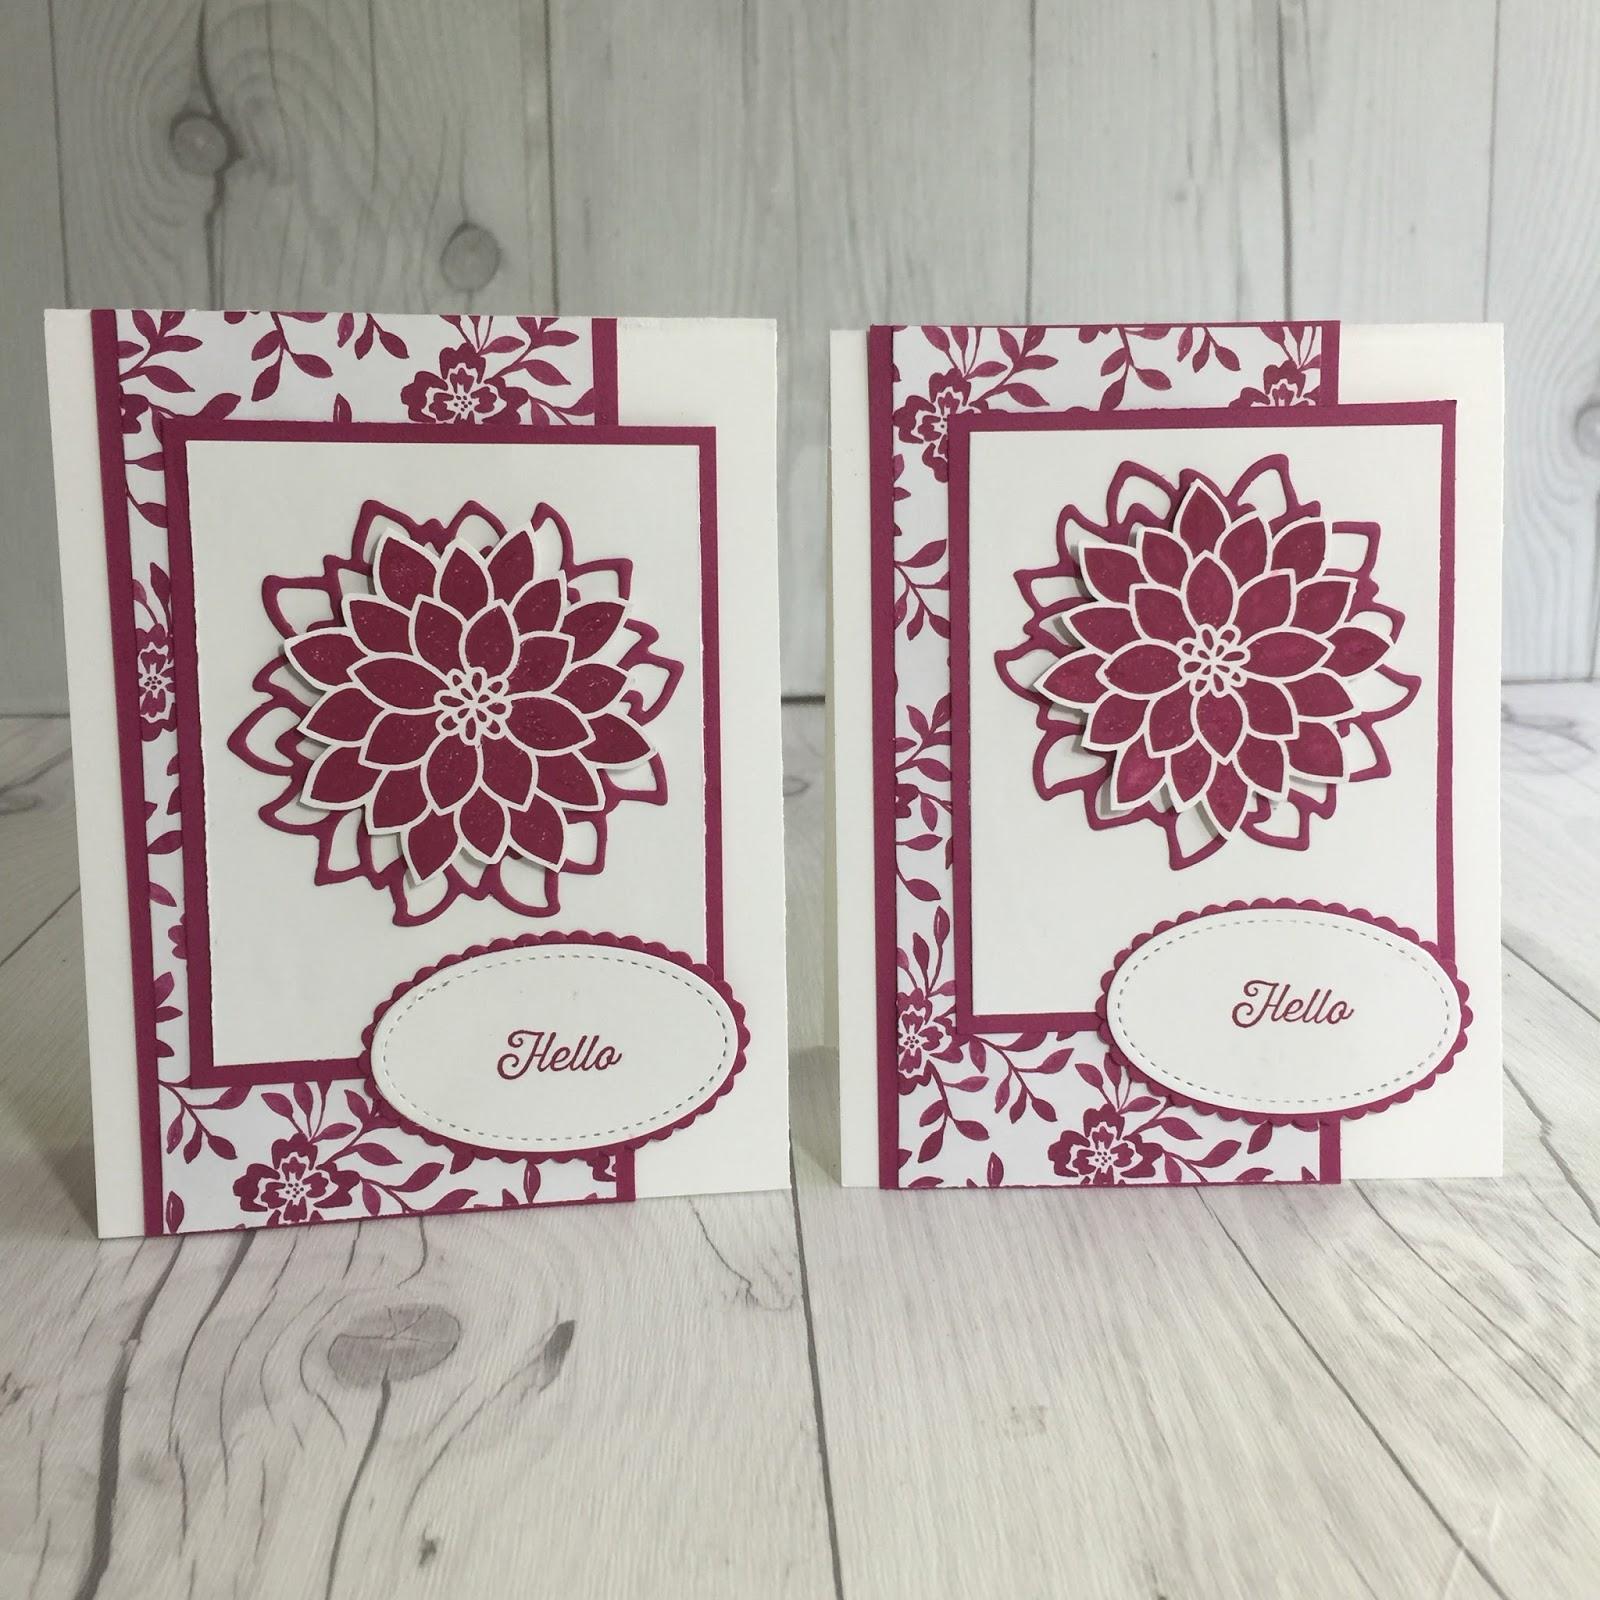 Stamped Sophisticates Flourishing Phrases Card Using Berry Burst